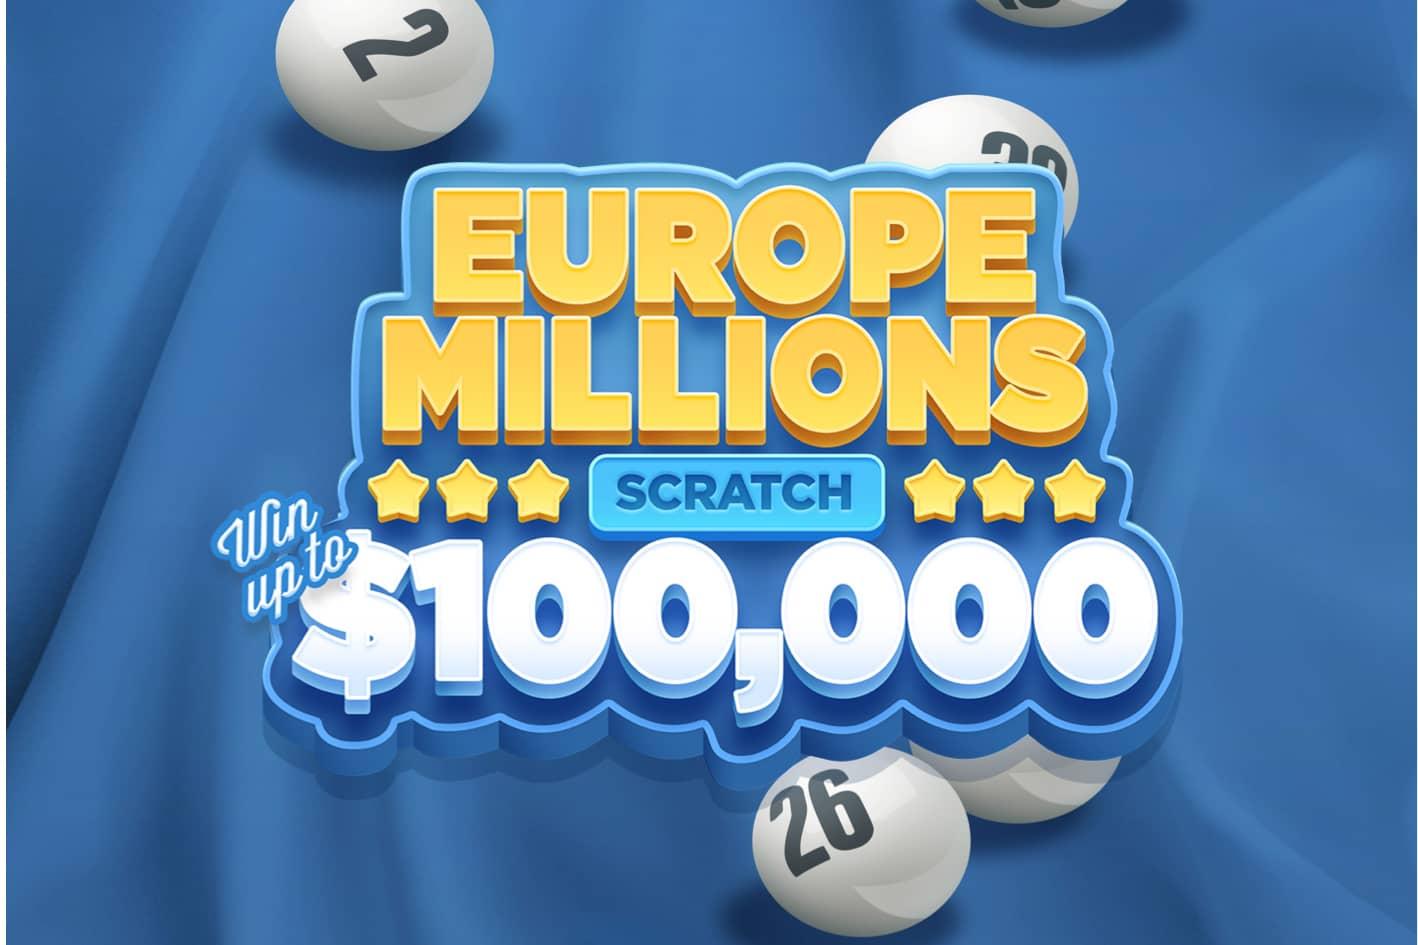 Europe Millions Scratch